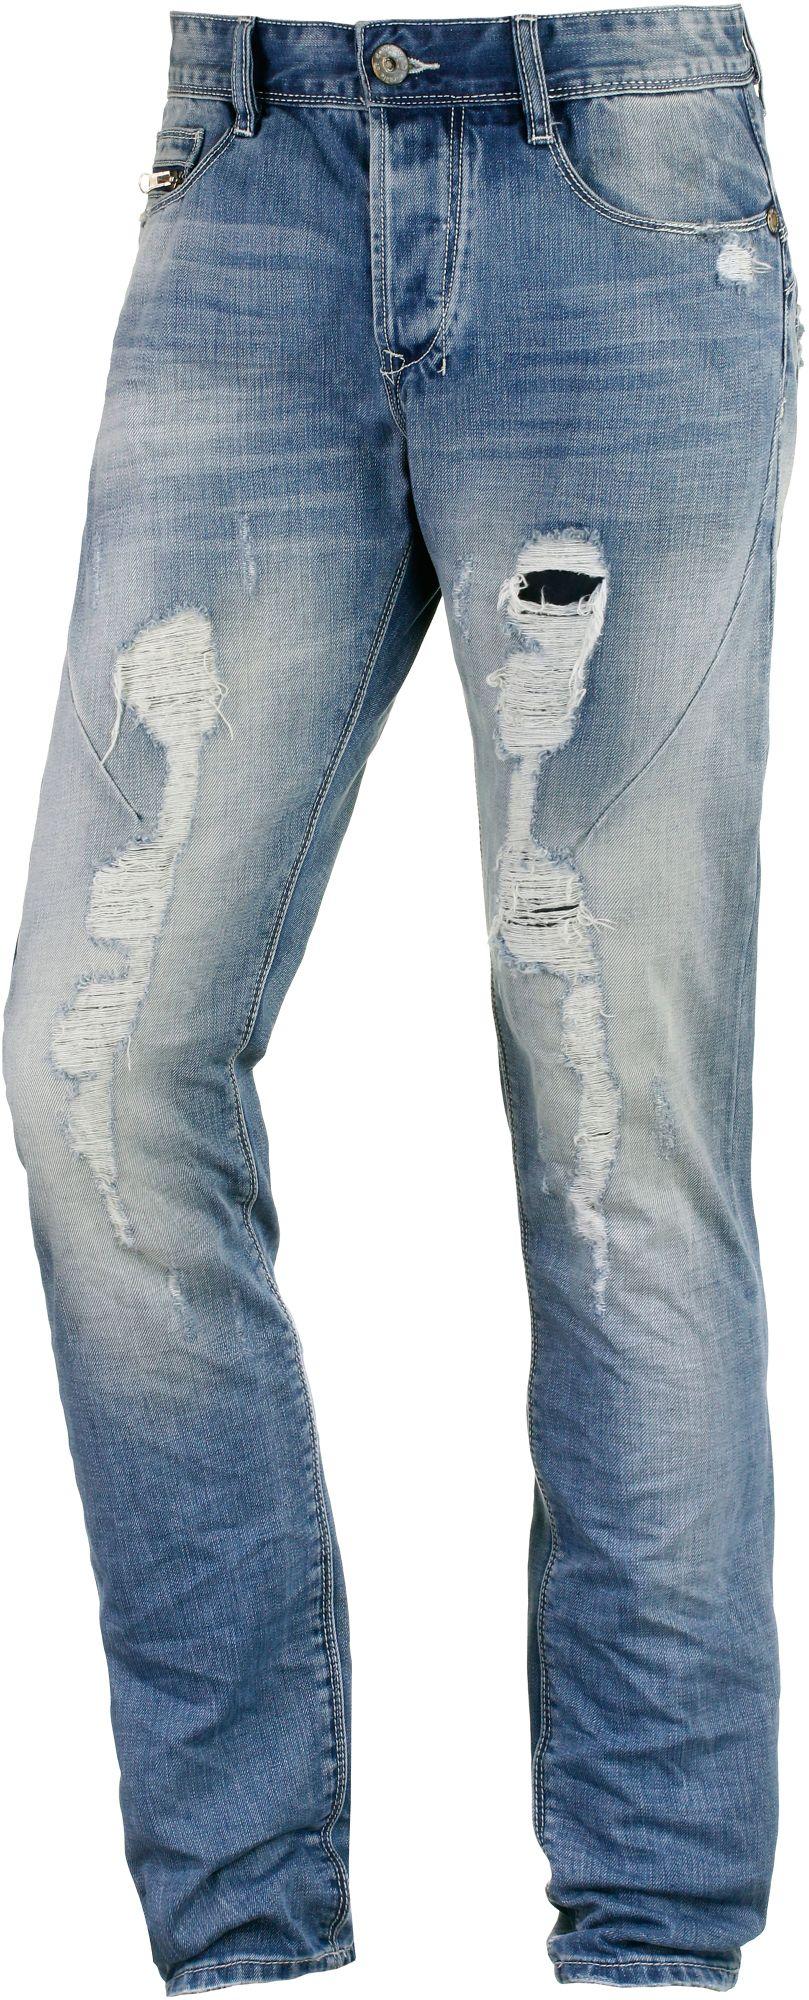 Leo Slim Fit Jeans Herren in blau, Größe 36 / 32